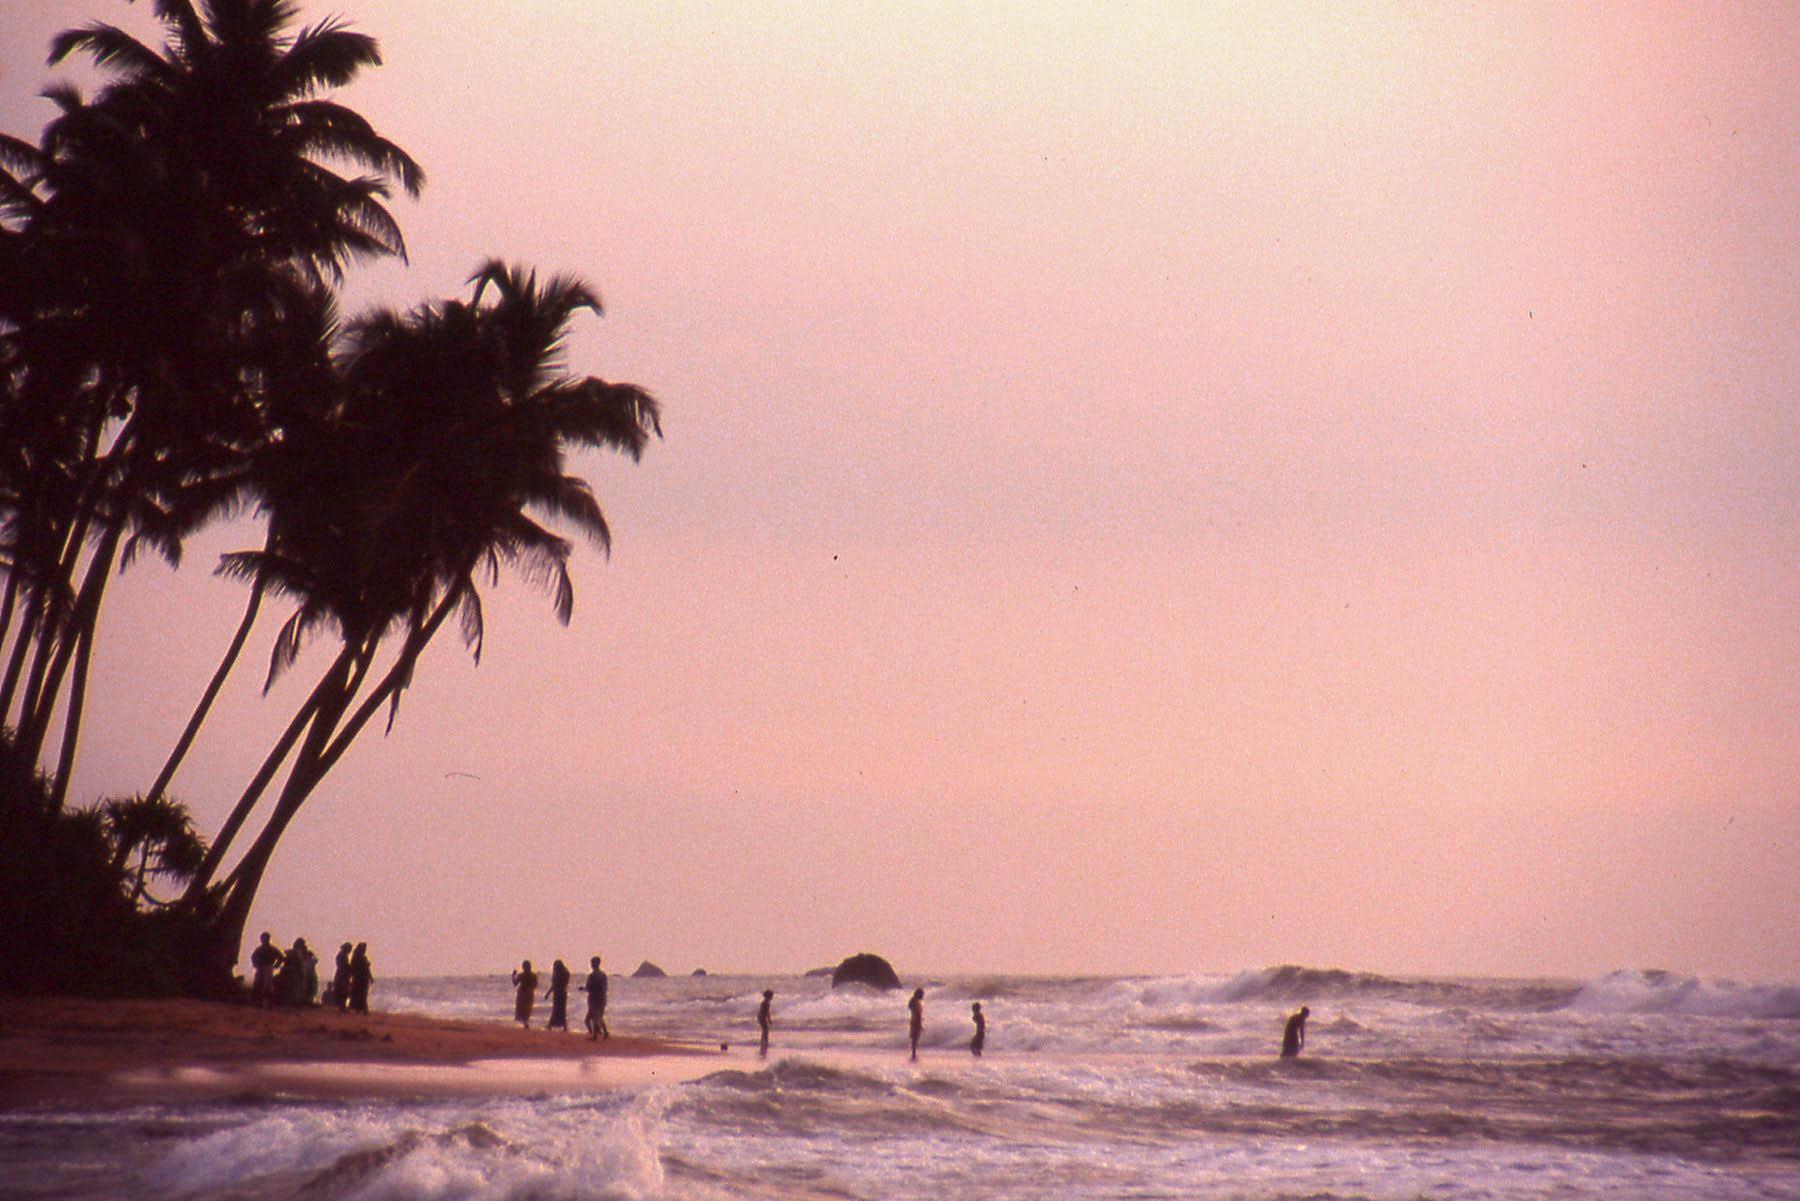 Northern beaches of Sri Lanka © JonoVernon-Powell.com